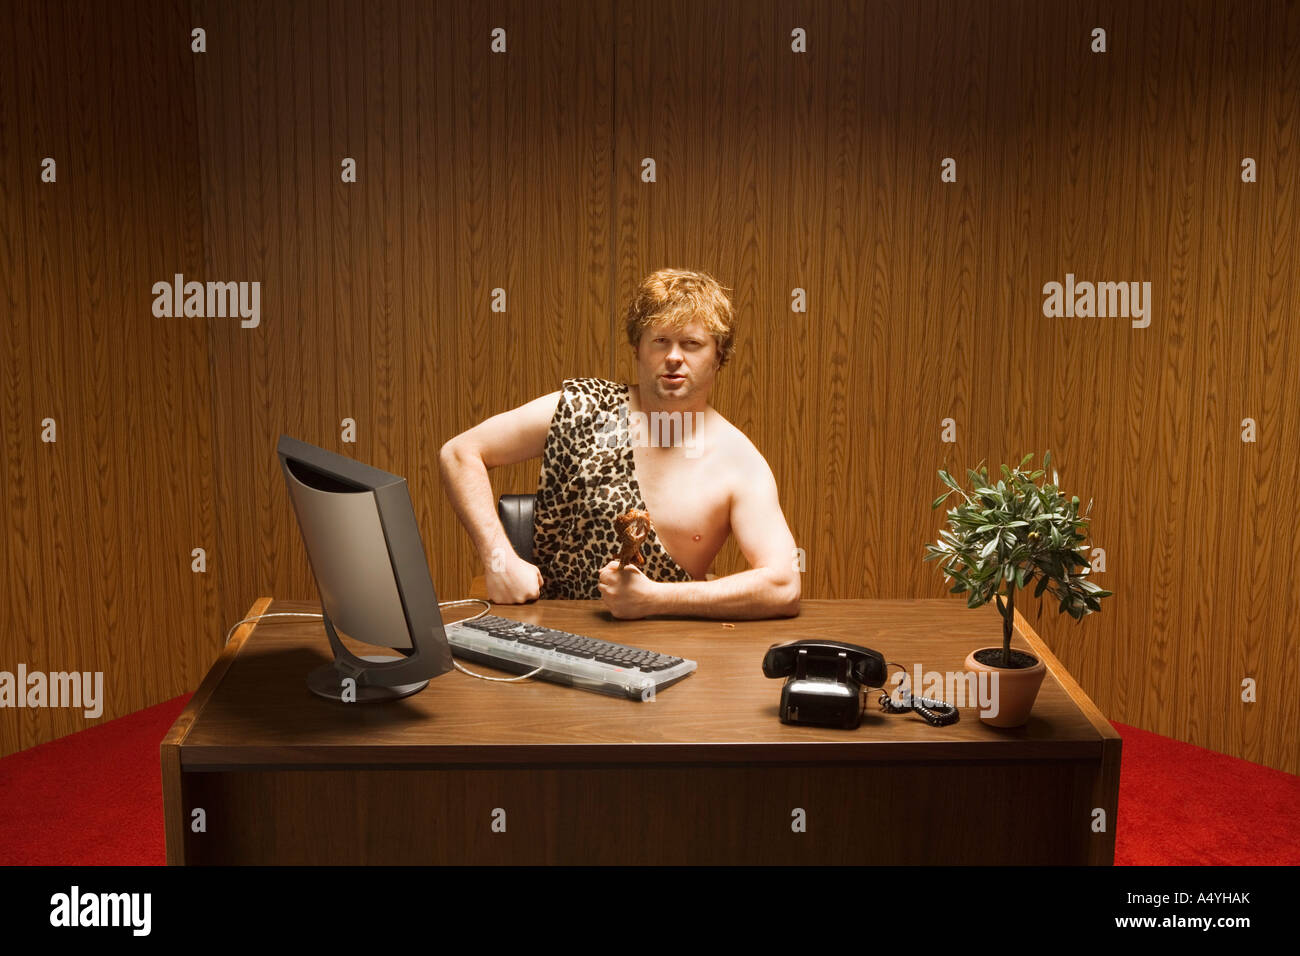 Businessman dressed as caveman at desk - Stock Image